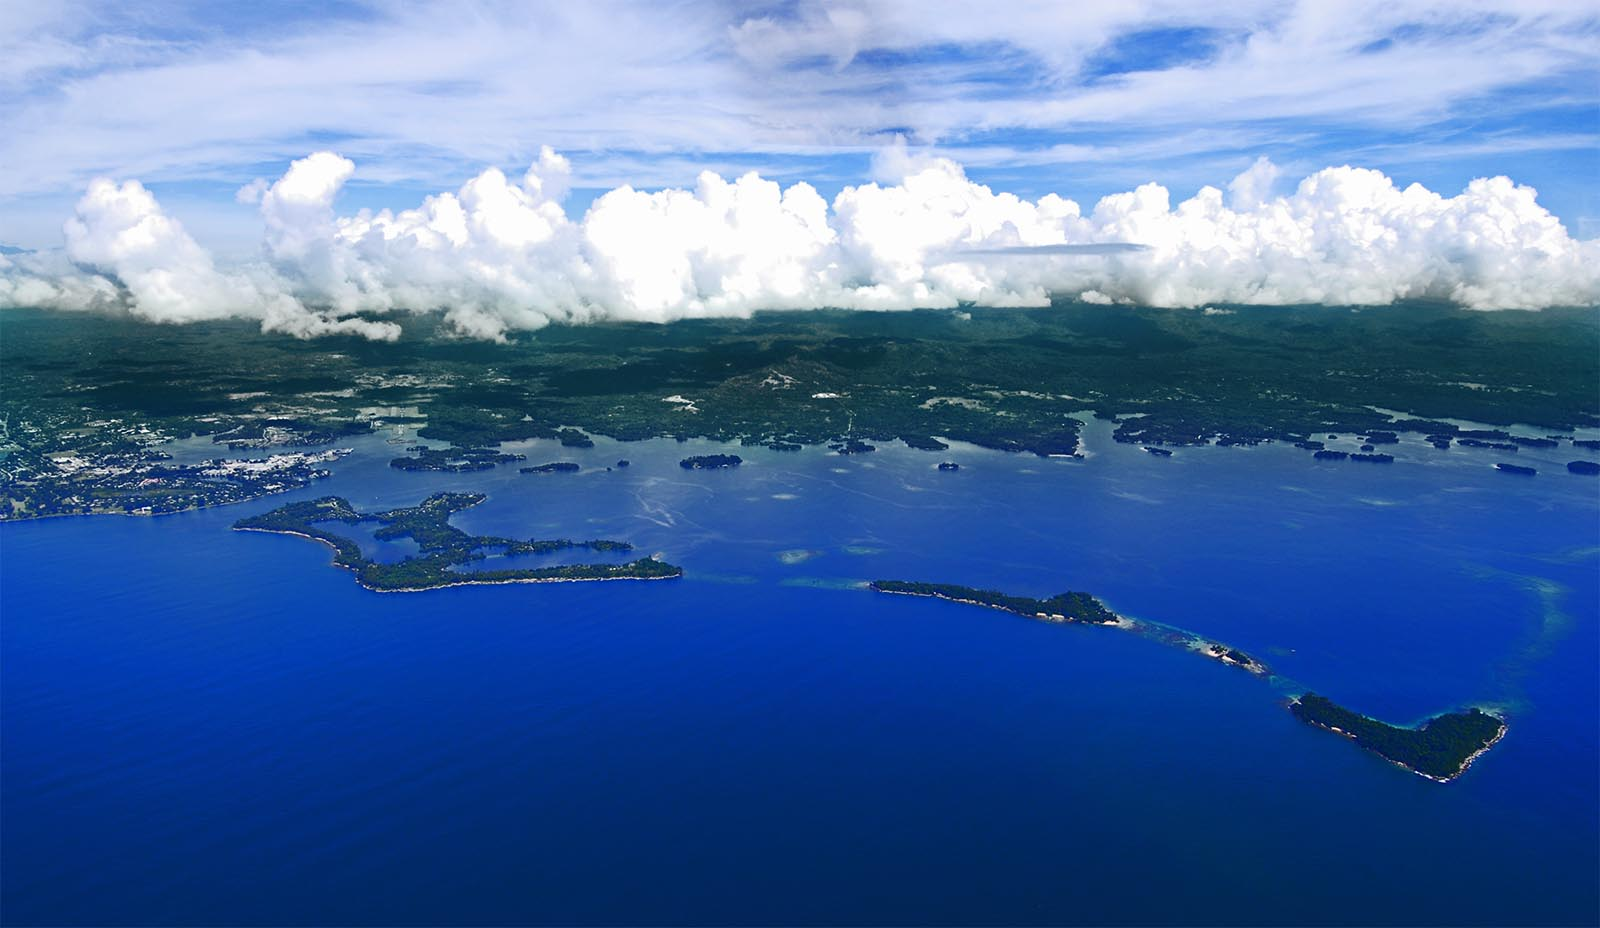 Madang - The View from Heaven   Madang - Ples Bilong Mi